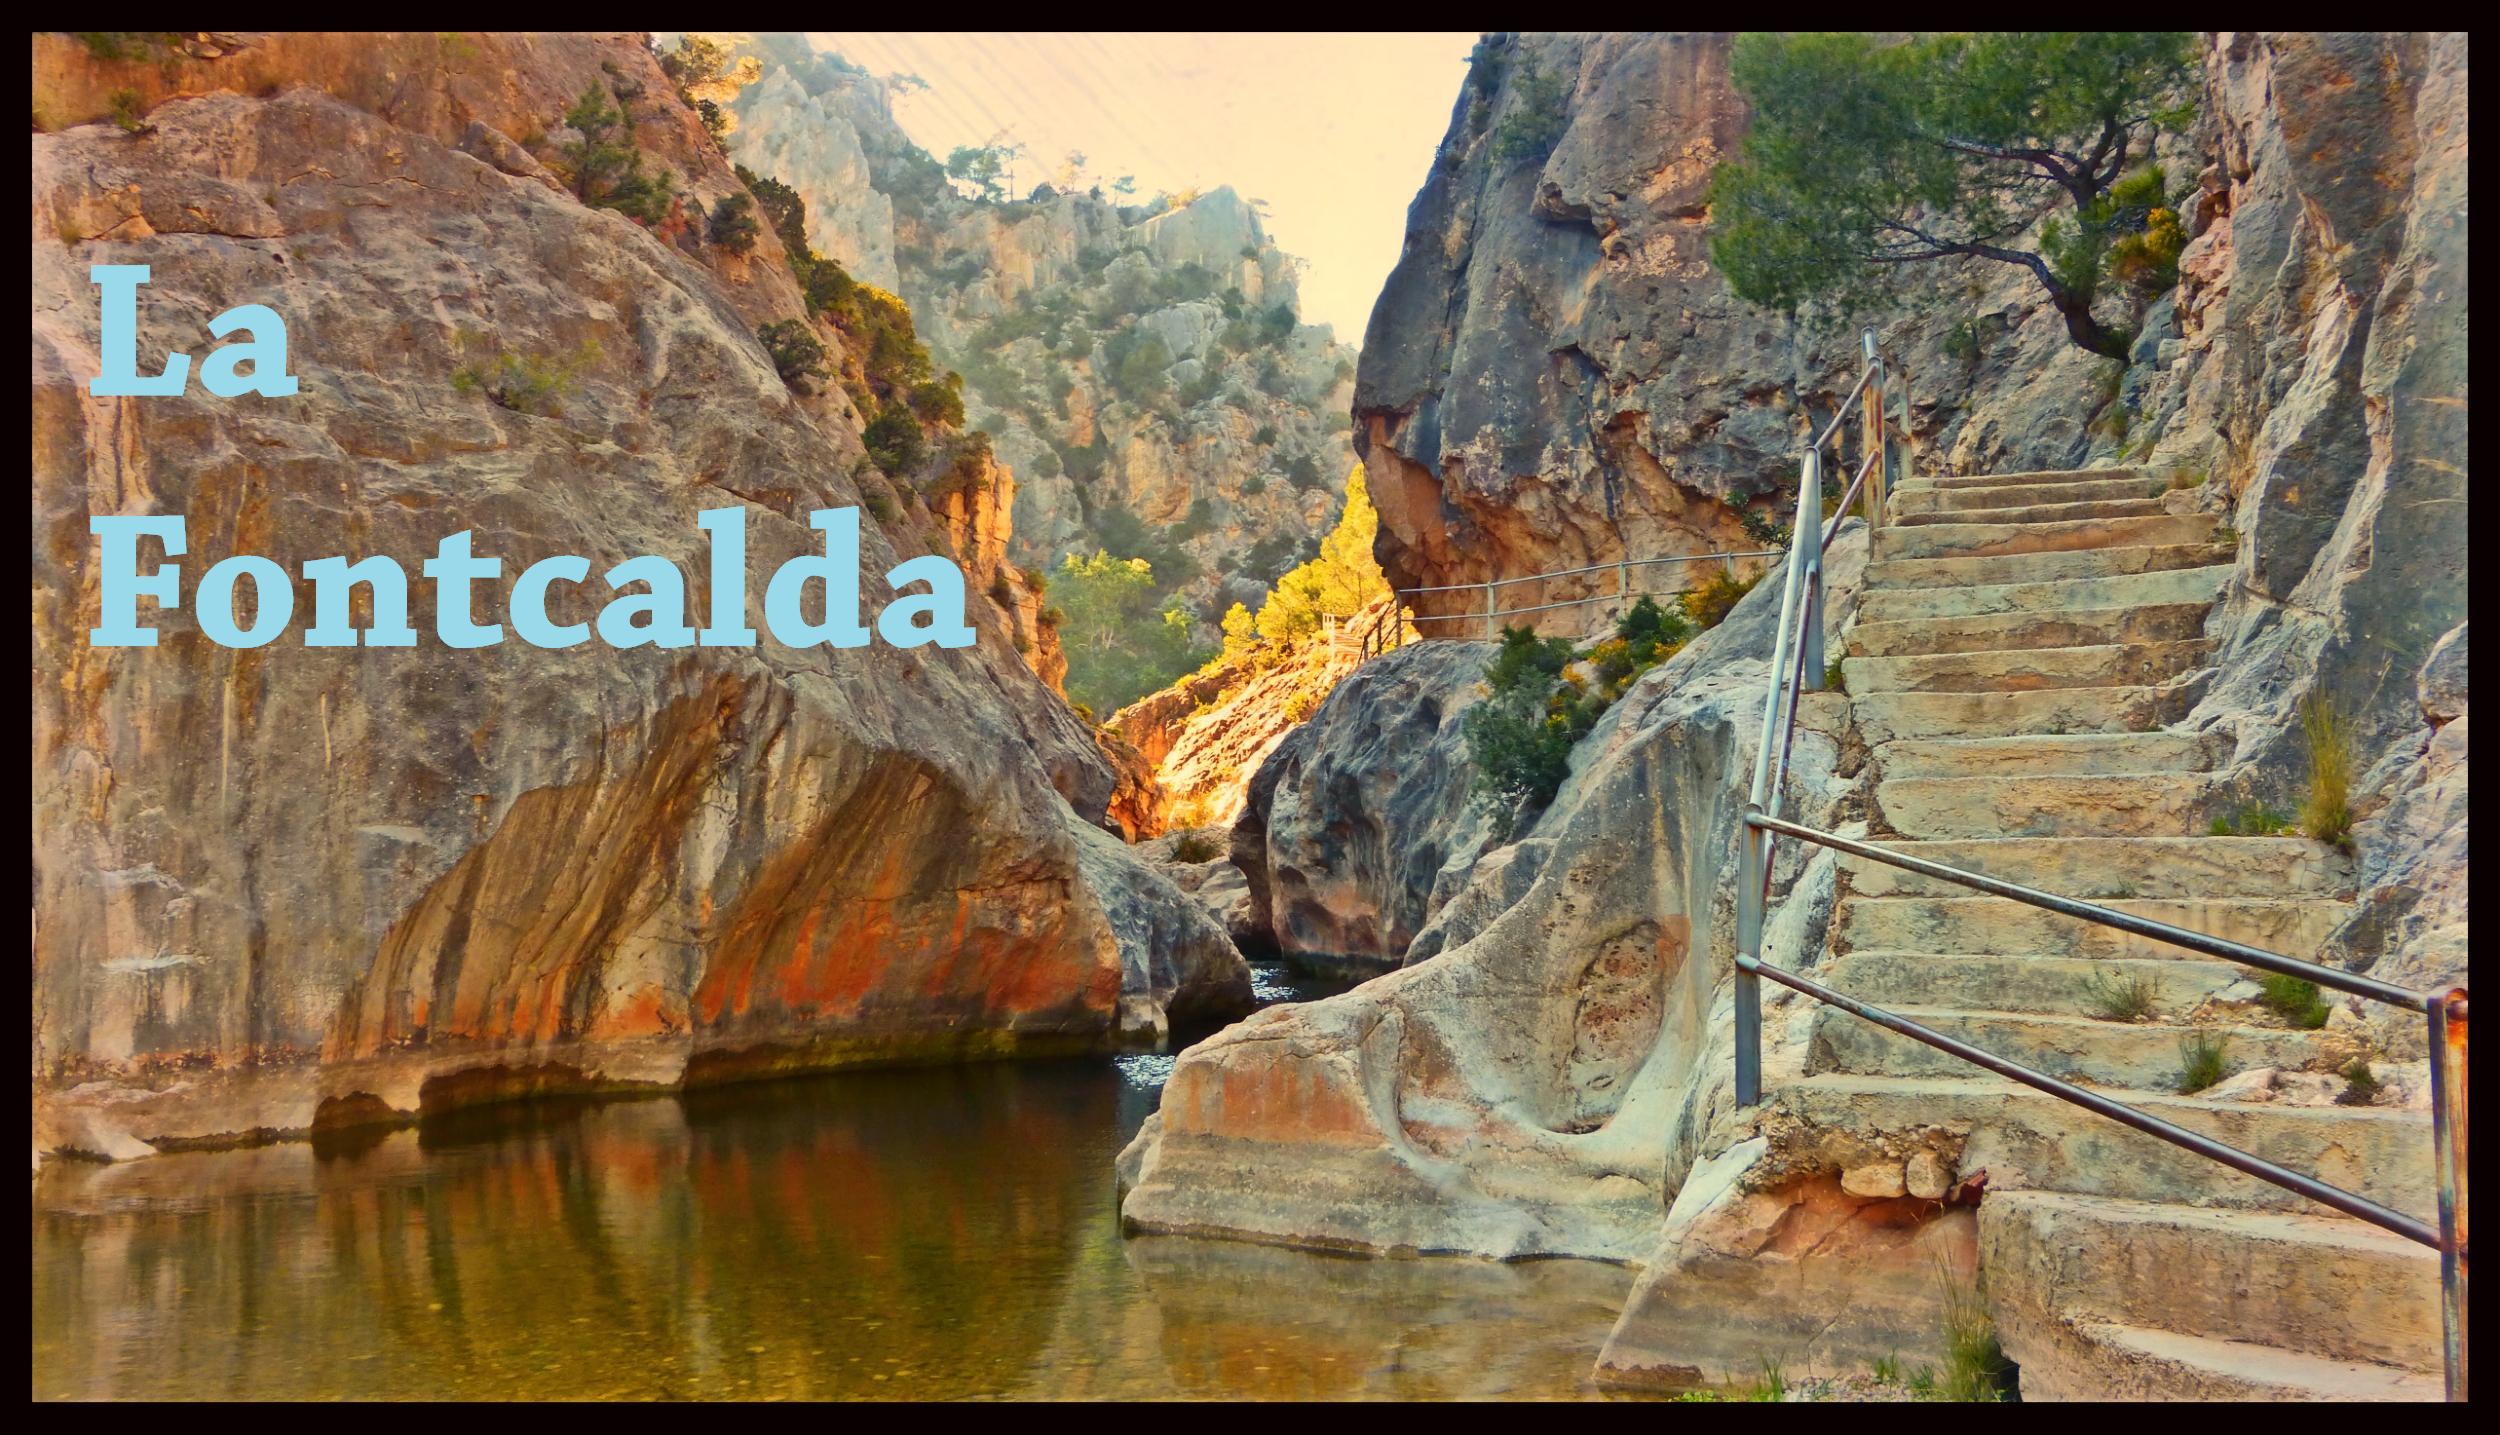 La fontcalda balneario salvaje 1 v deos tarragona for Piscina natural de fontcalda